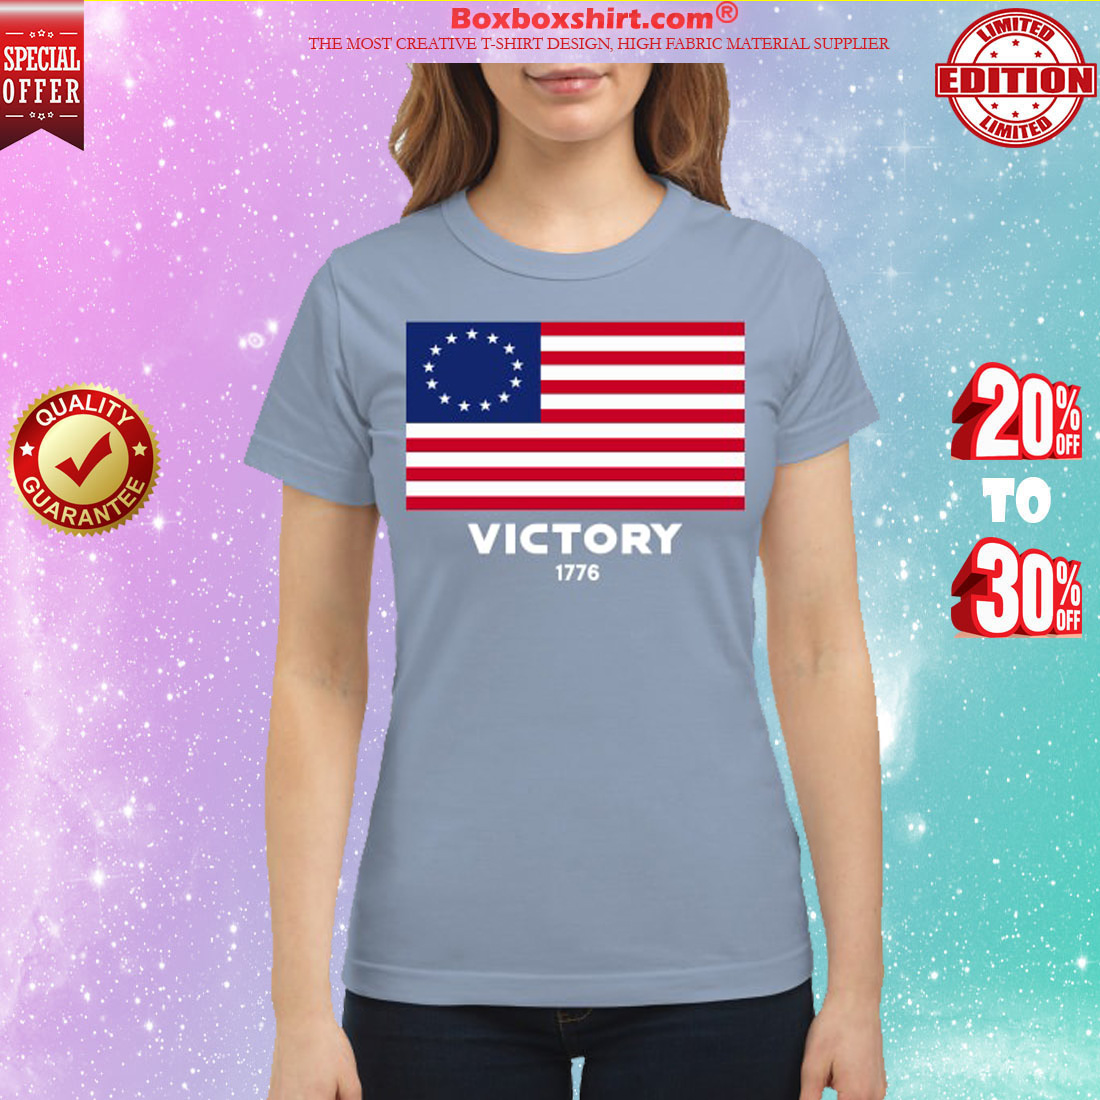 USA American flag victory 1776 classic shirt